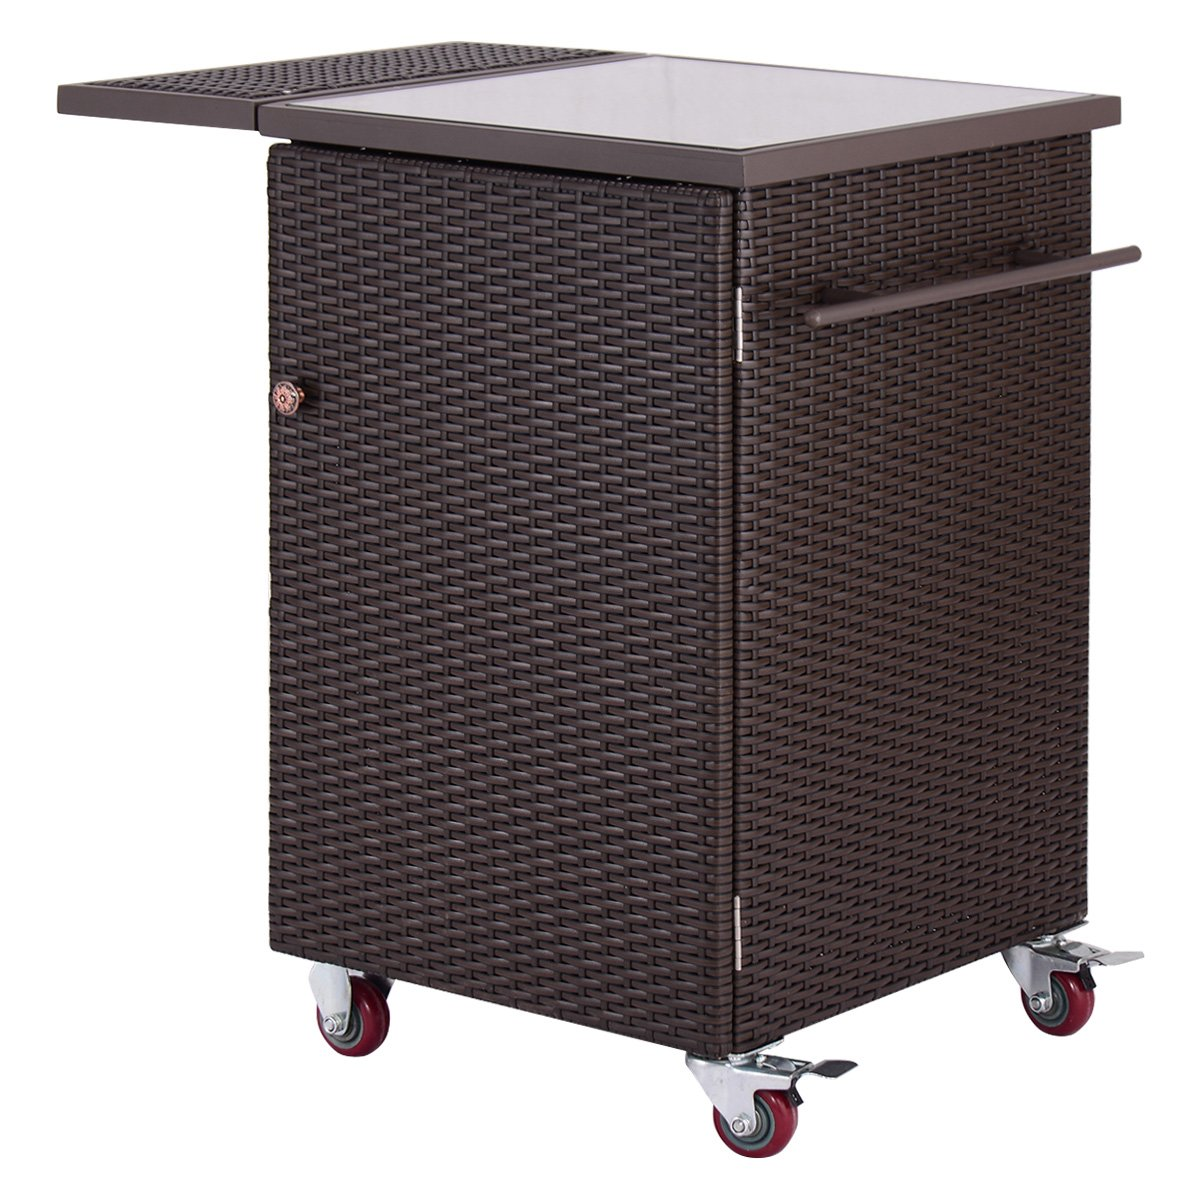 Giantex Brown Rattan Wicker Kitchen Trolley Cart Patio Roller Dining Storage Glass Stand (Brown)